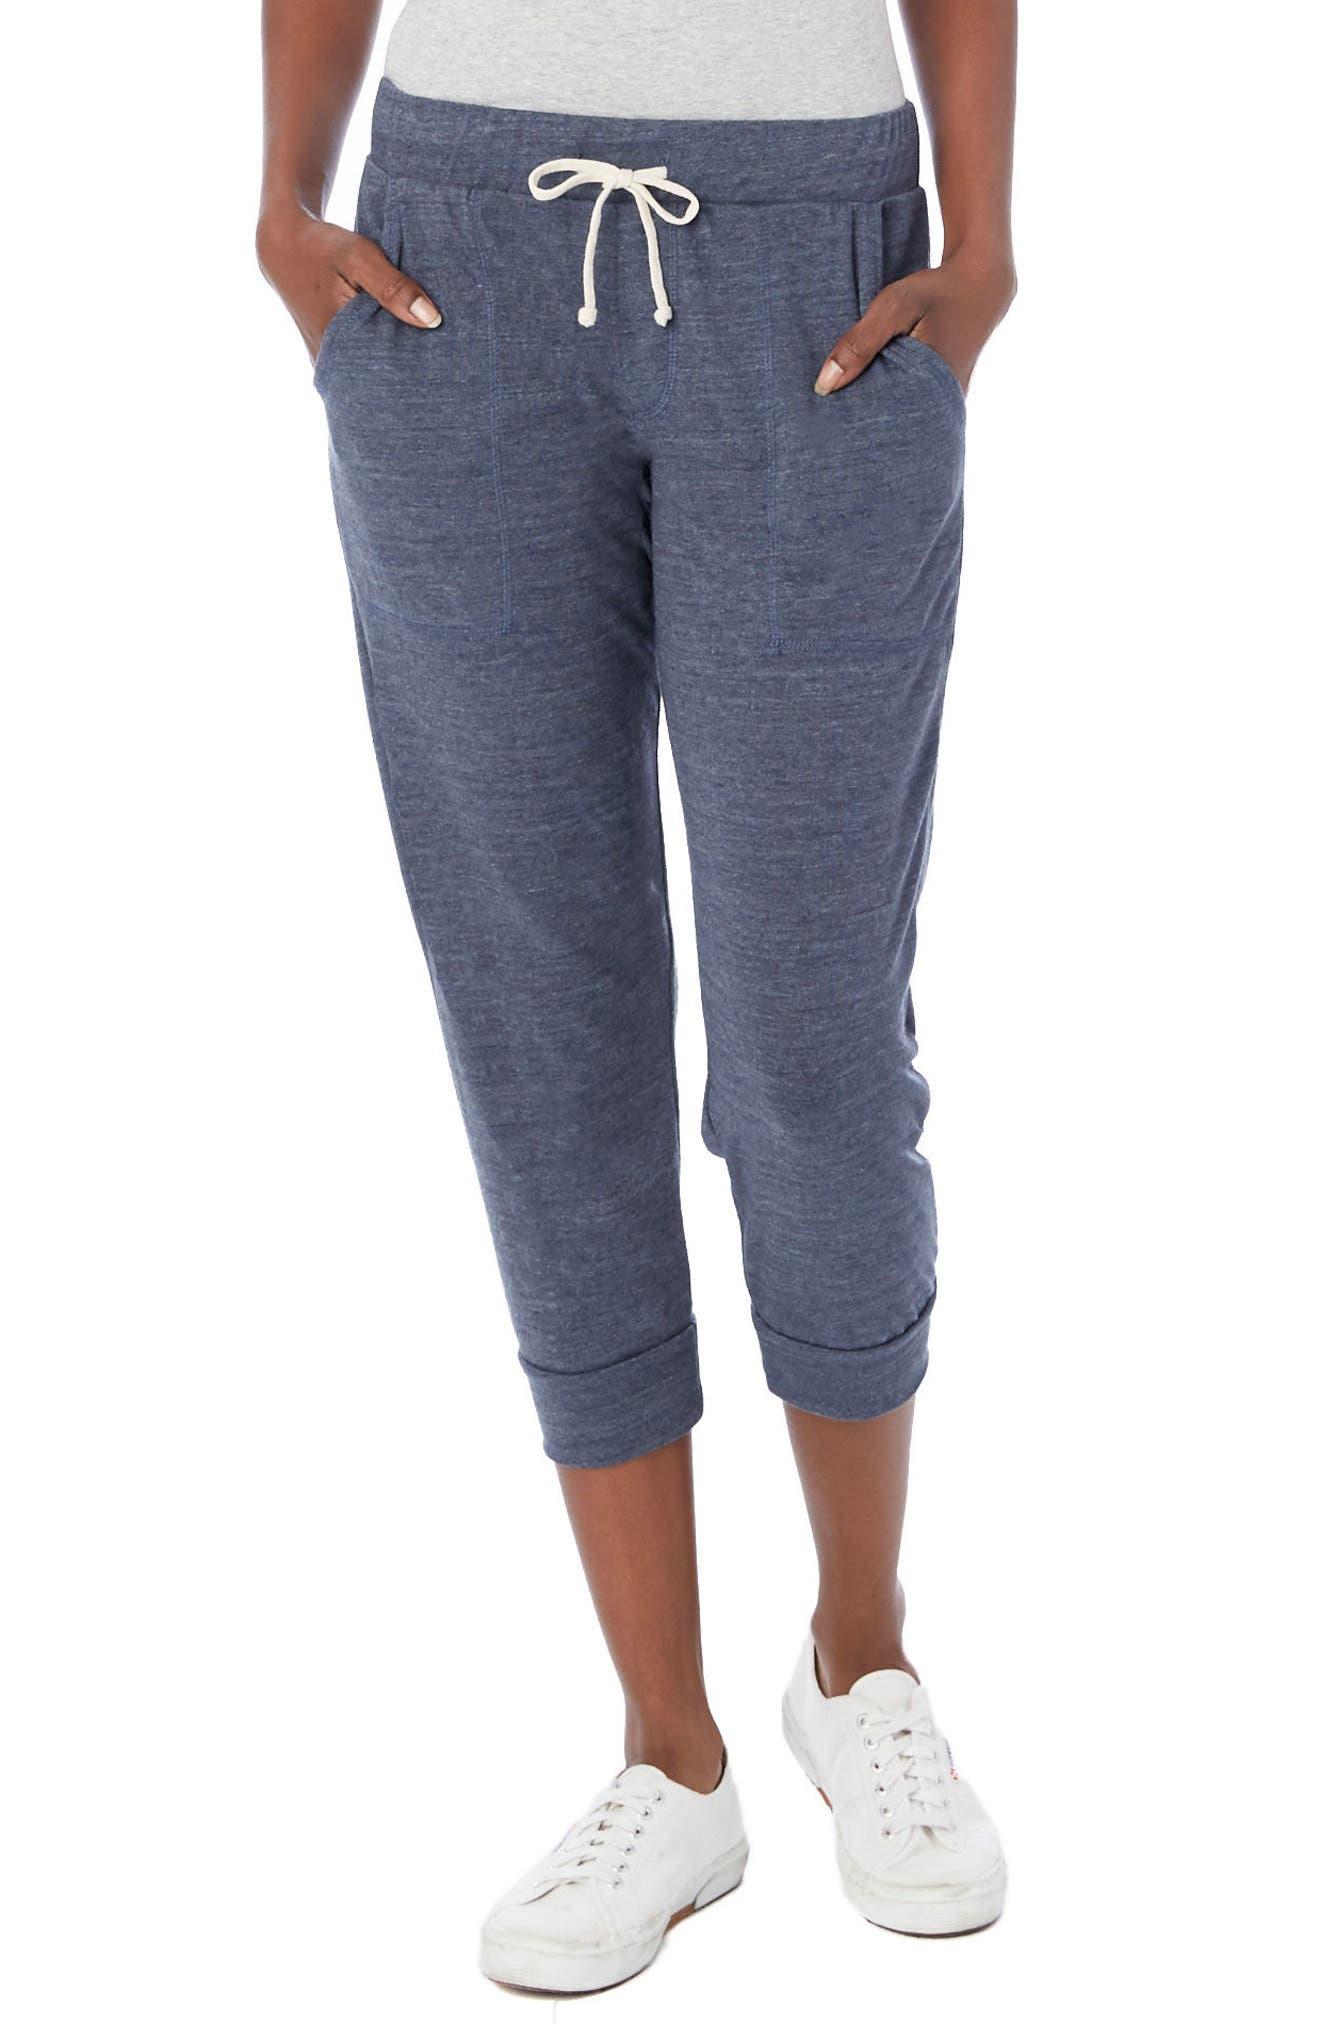 Eco Crop Jogger Lounge Pants,                         Main,                         color, Eco True Navy